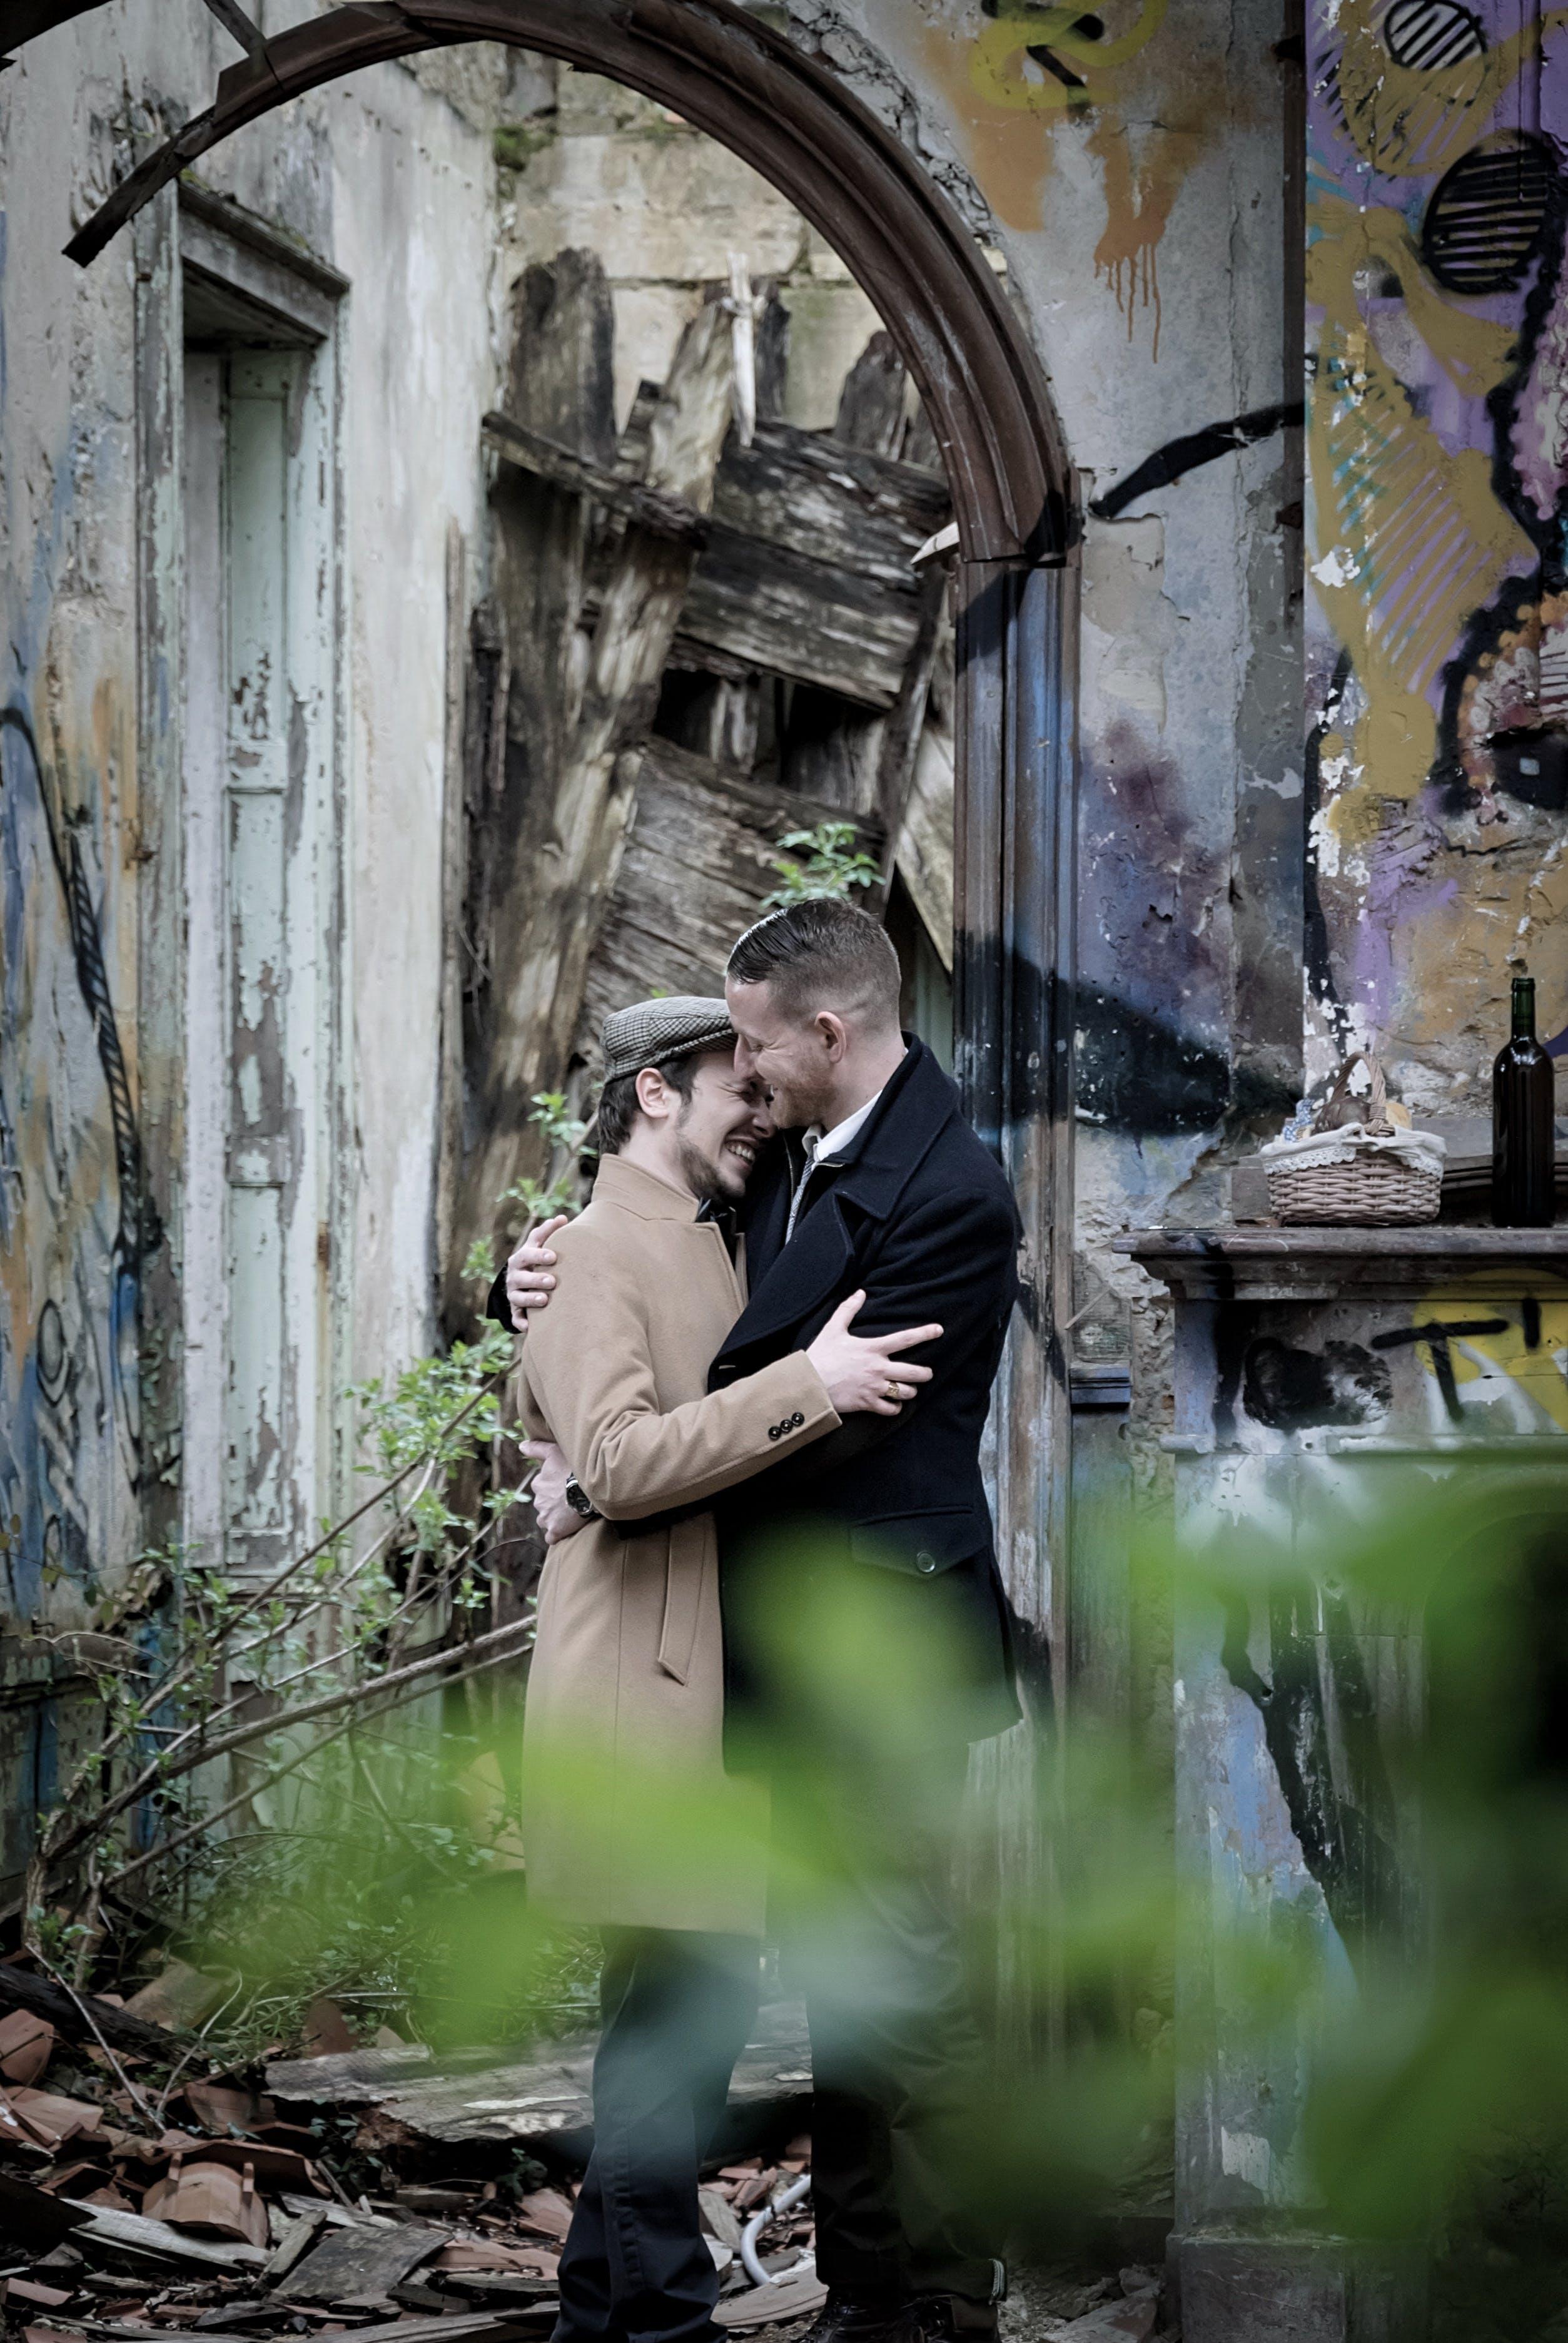 Man Embracing Man Near Gray Wall